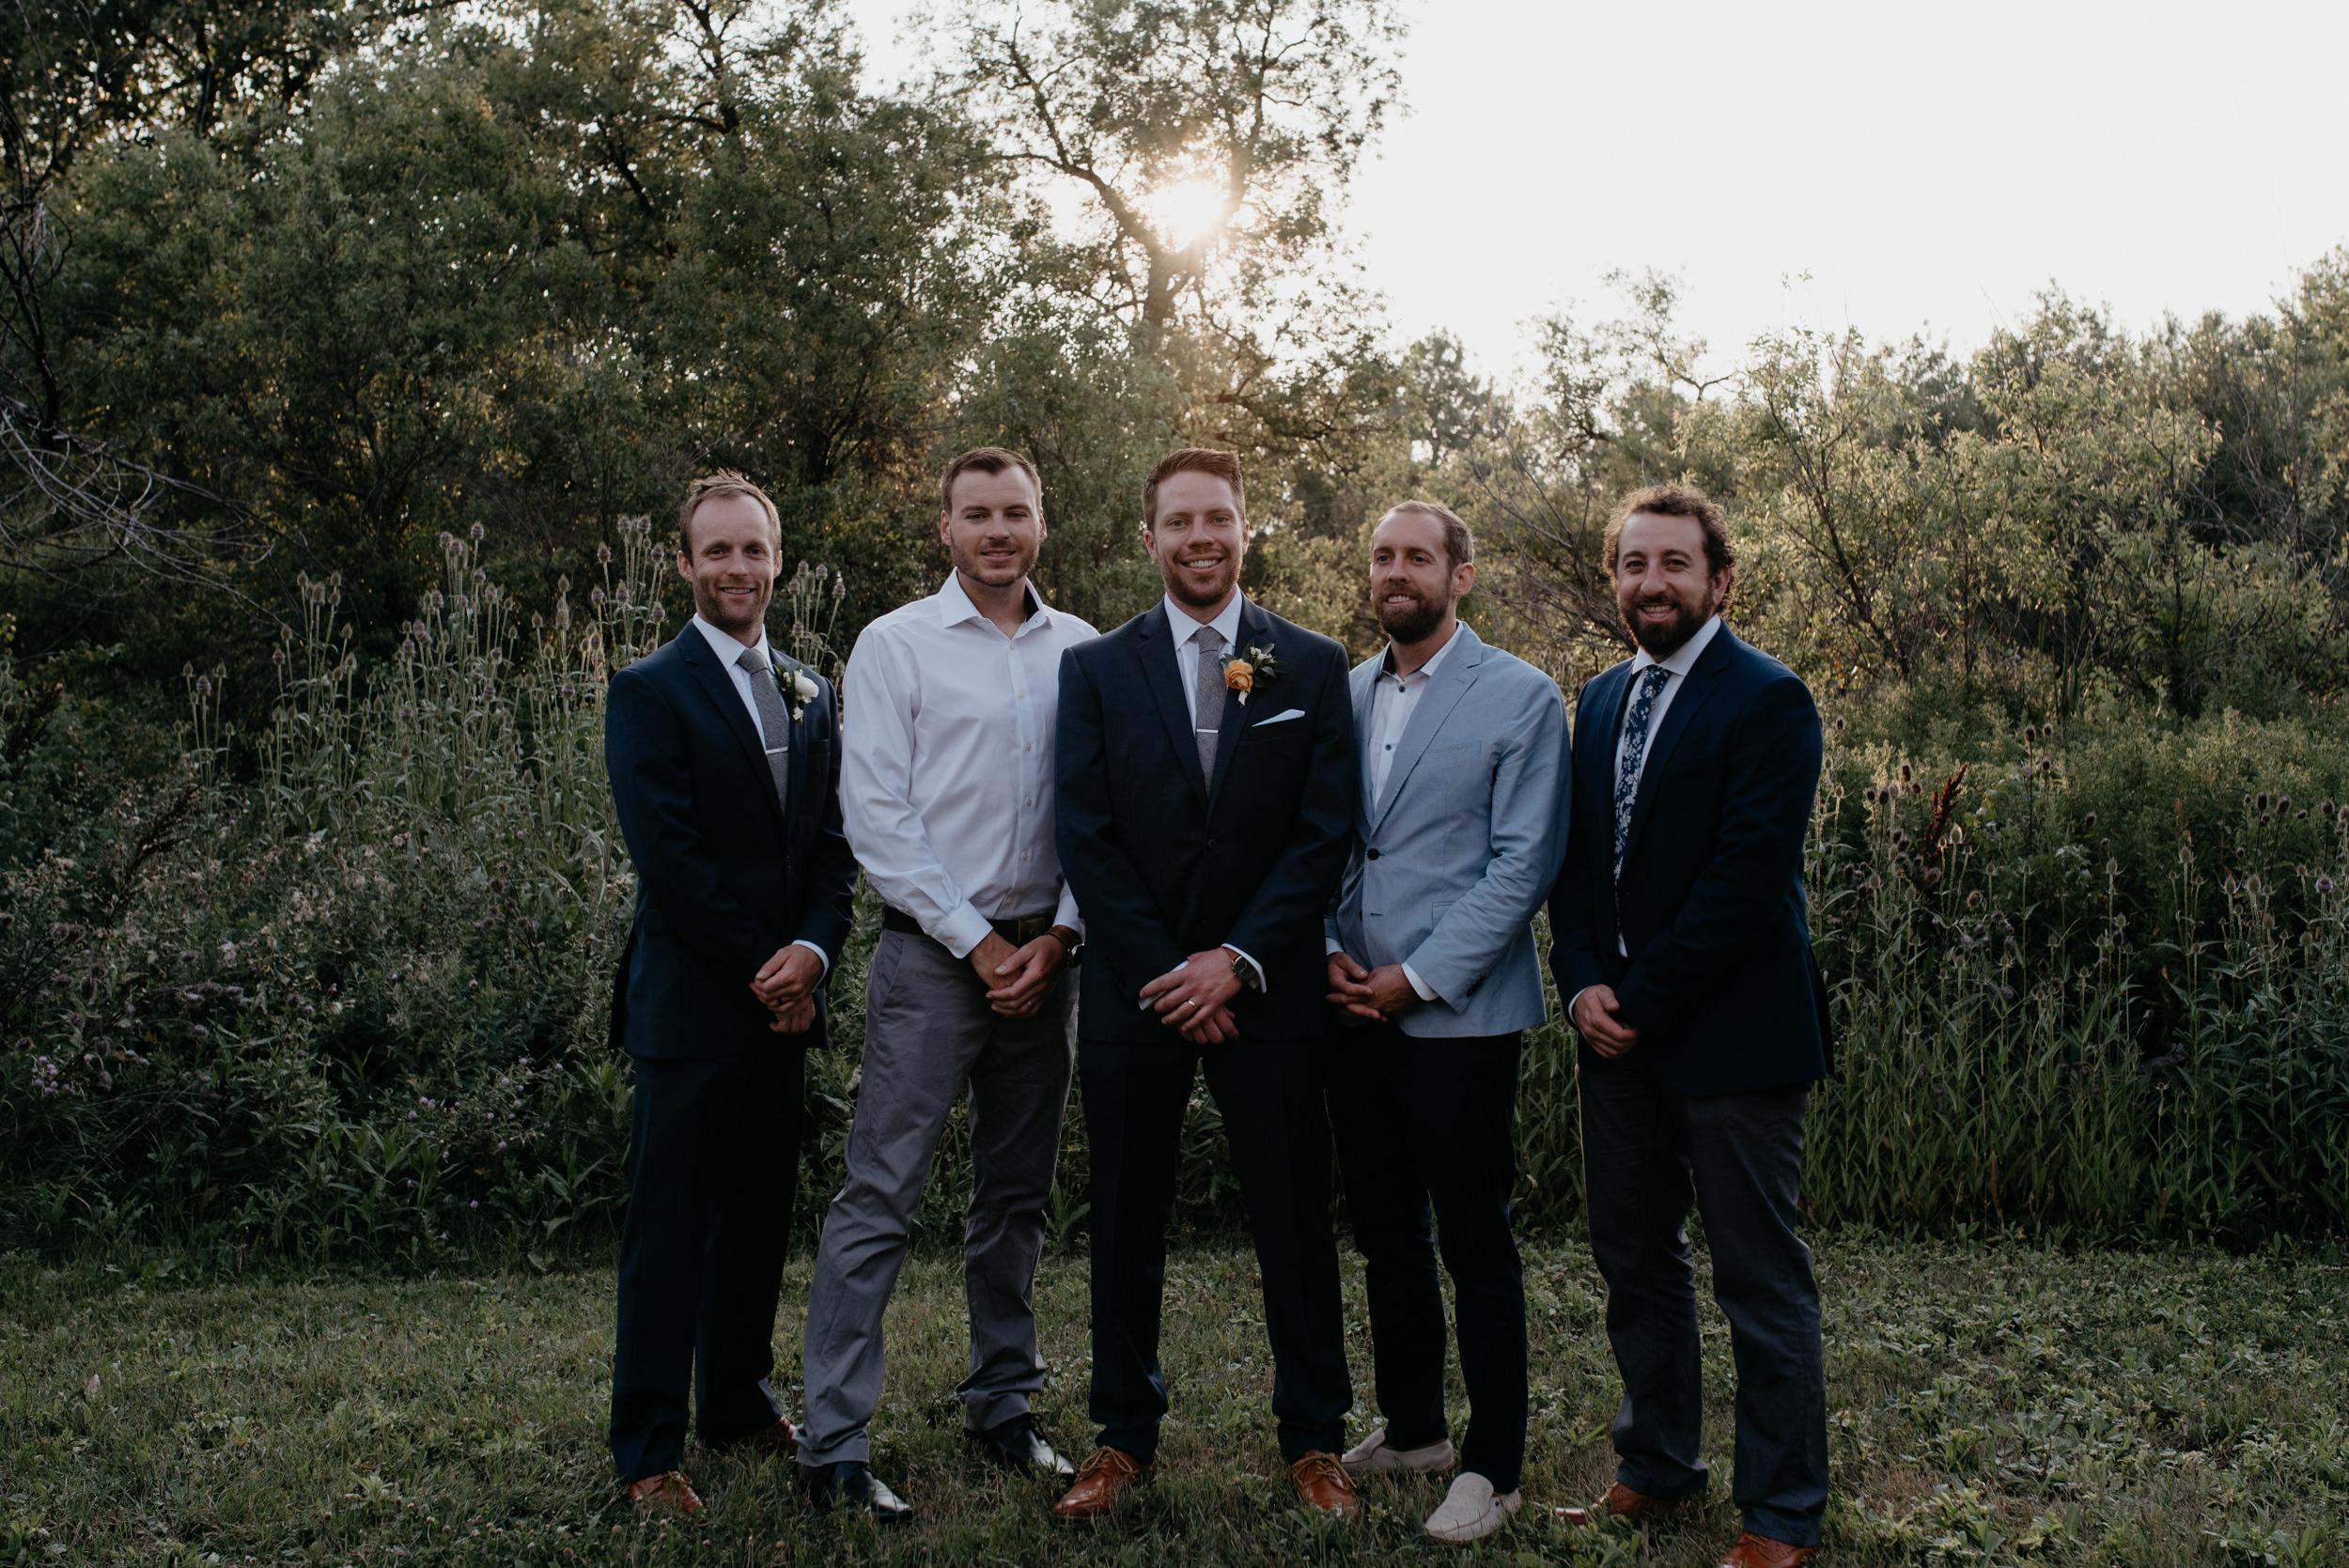 Groomsmen photo inspiration. Denver, Colorado wedding photographer. Colorado adventure elopement photographer.